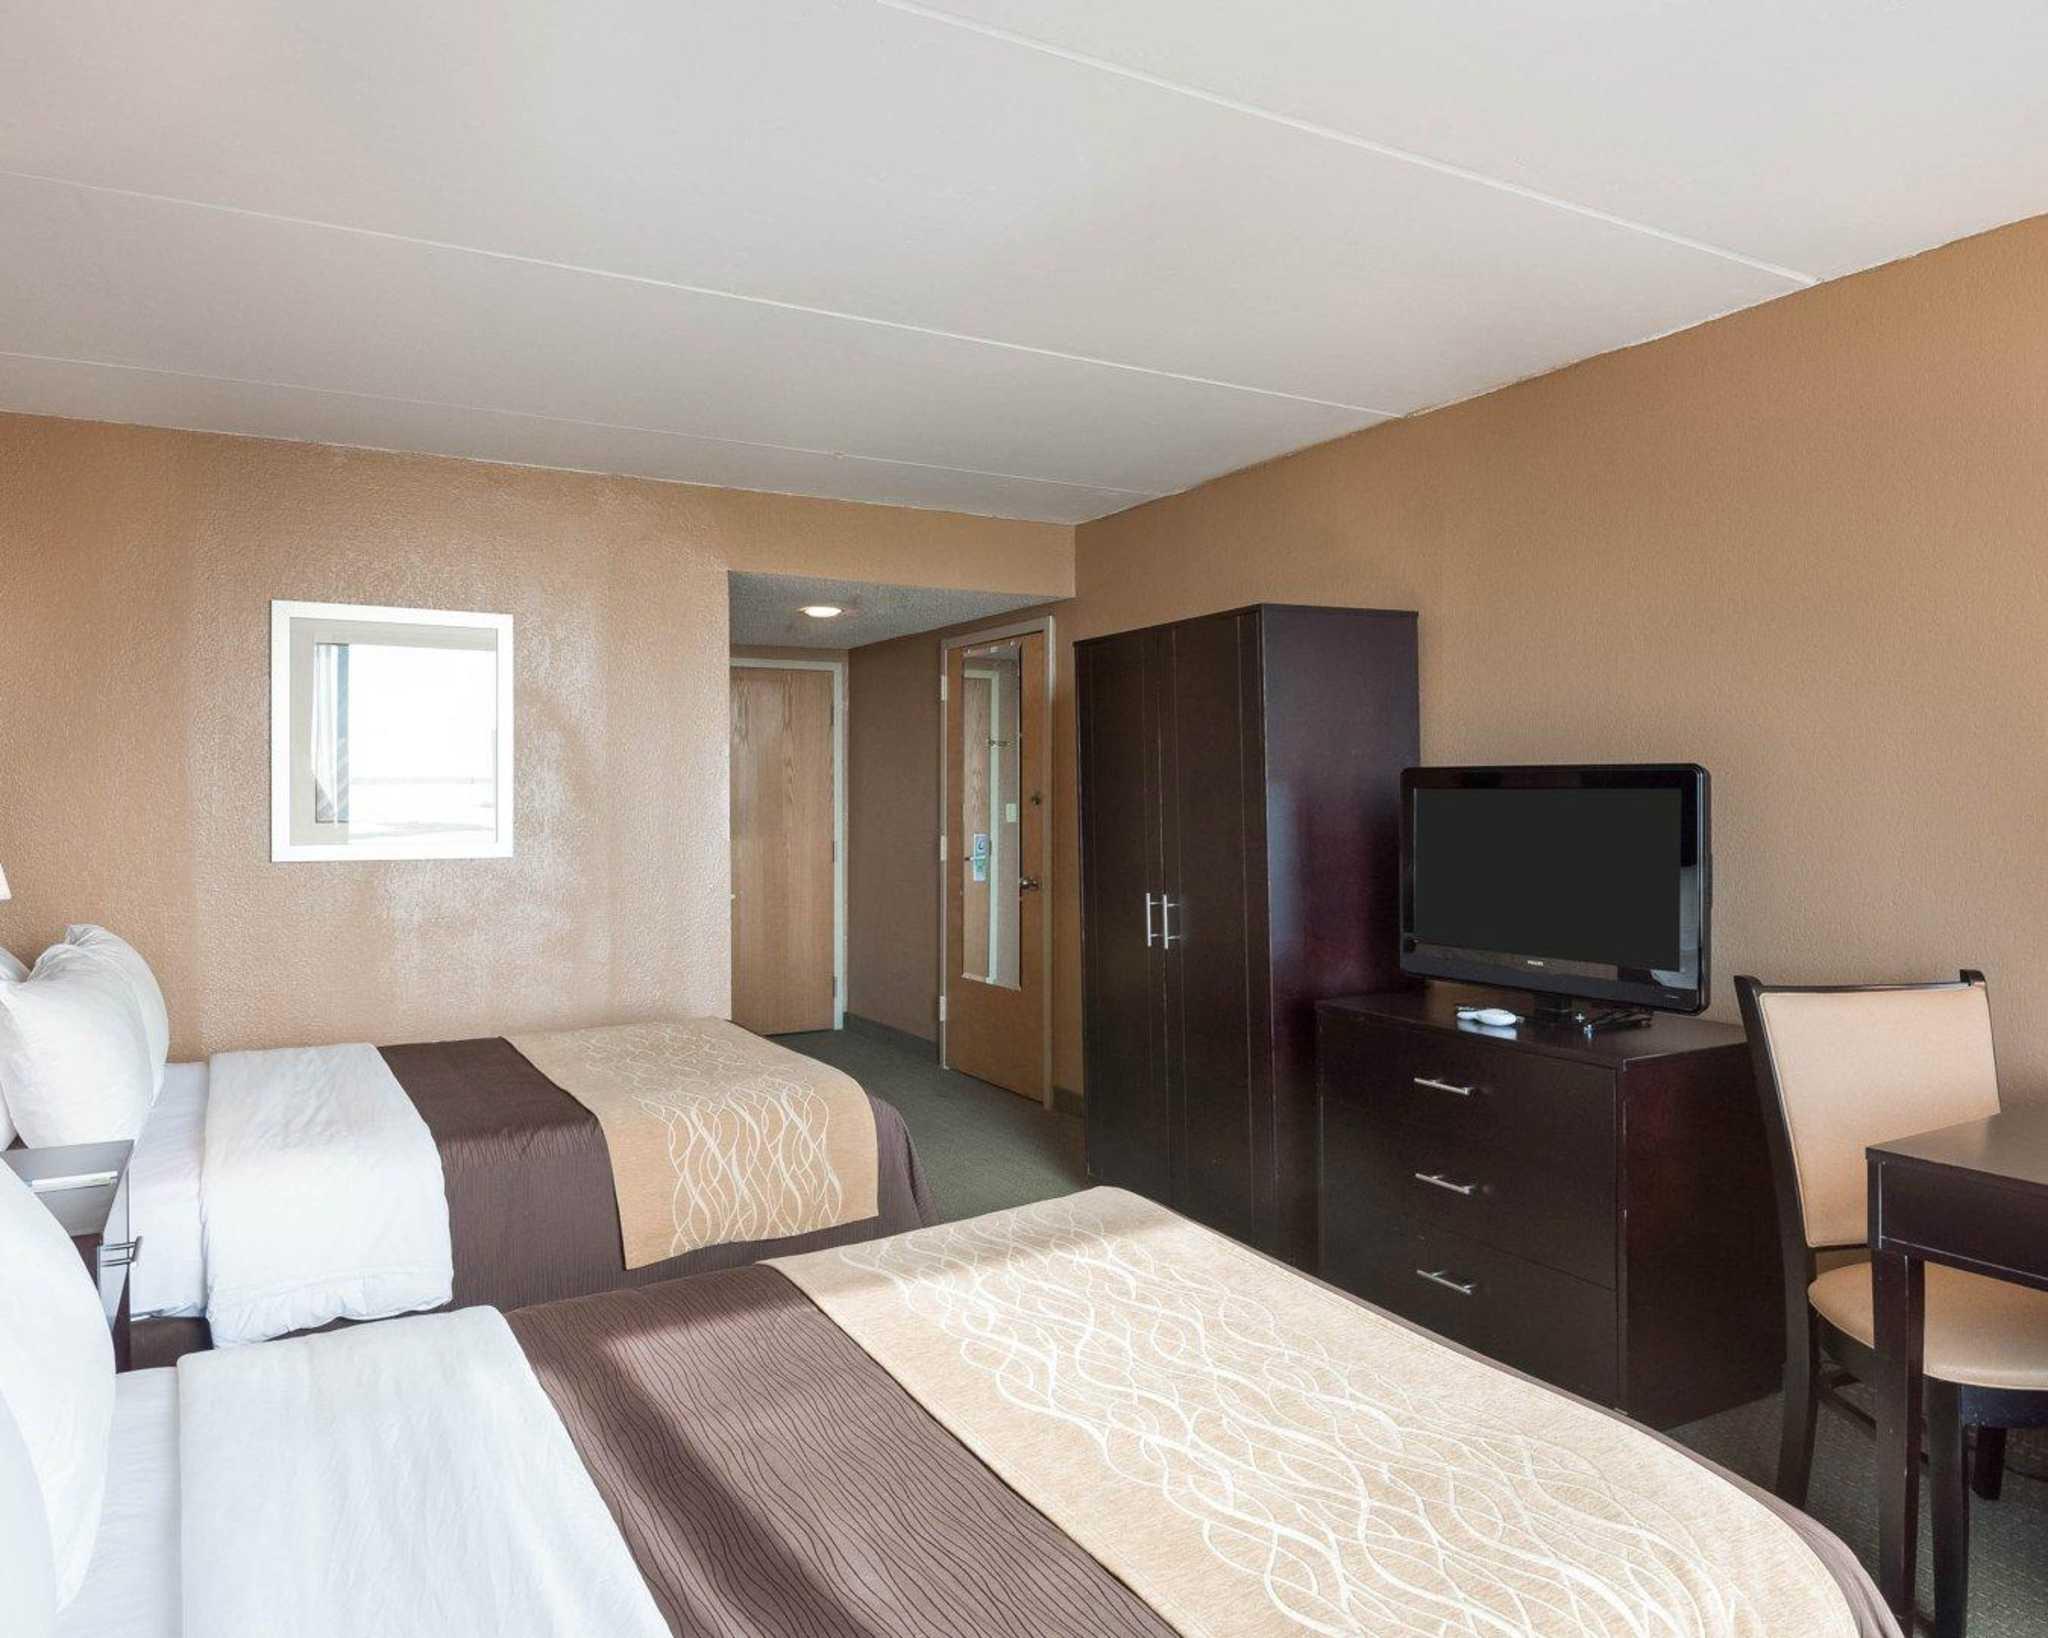 Comfort Inn Gold Coast image 14